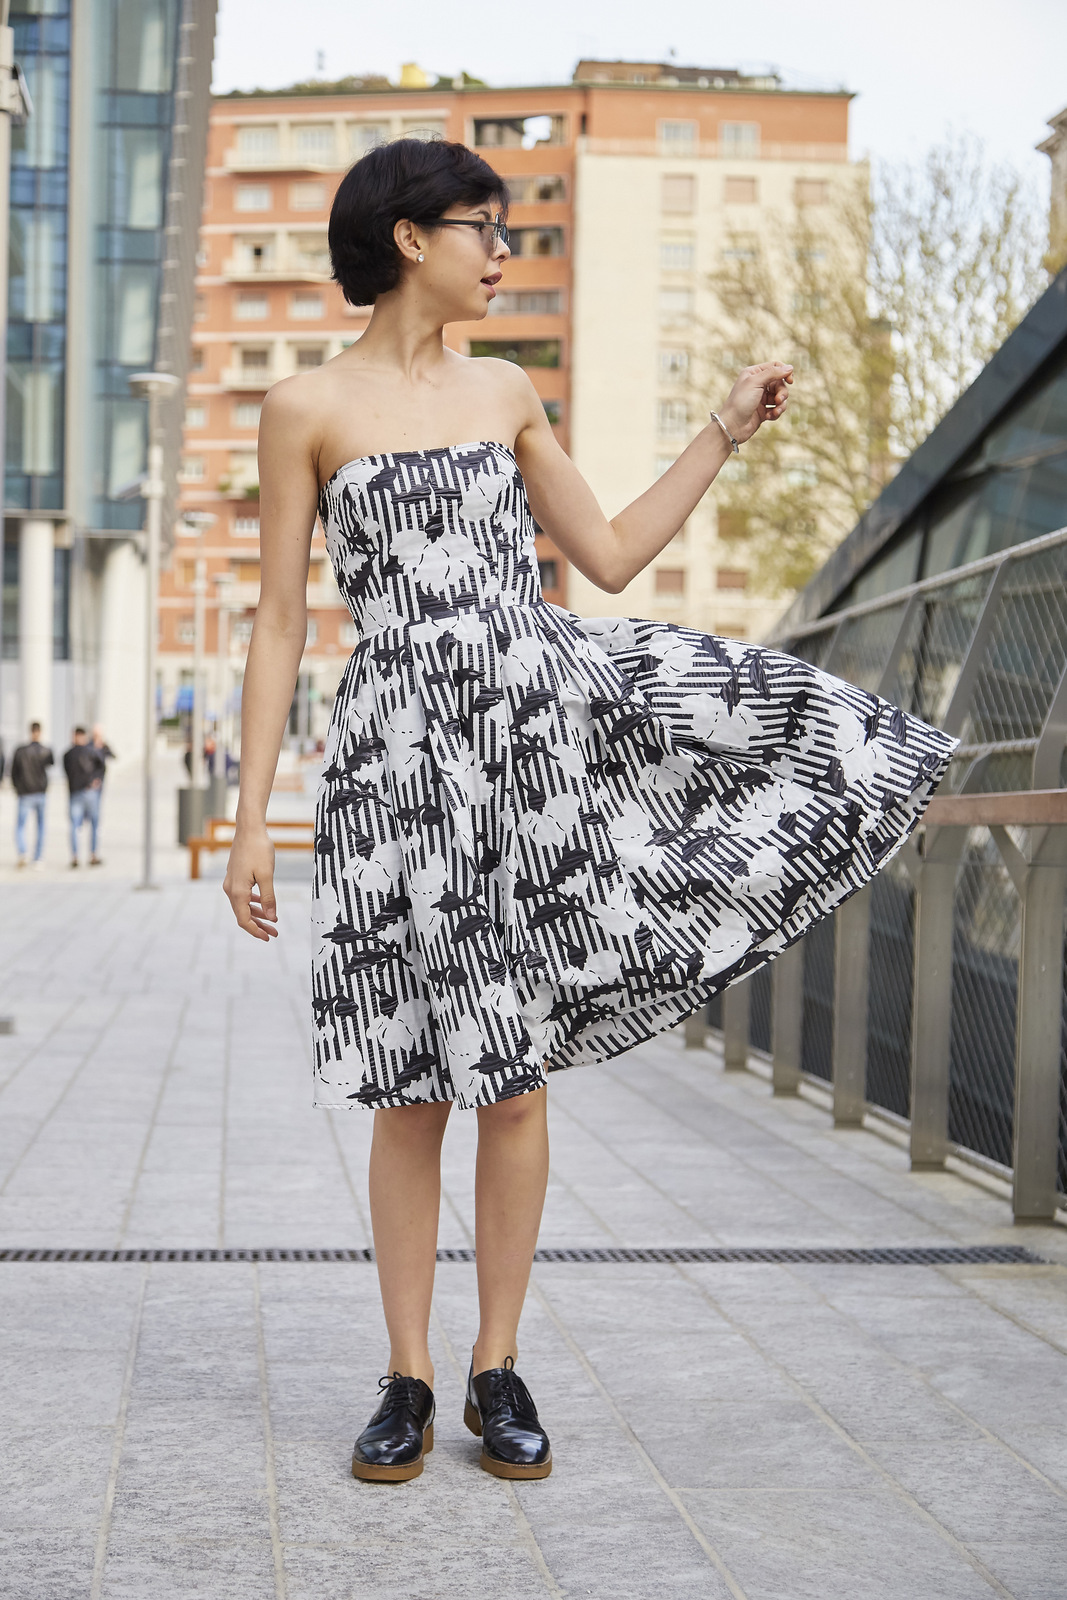 Culture & Trend, Culture & Trend Magazine, fashion, jijil, Juliane Borges, model, ootd, outfit, spring, steve j. key, uno de 50, zerouv,